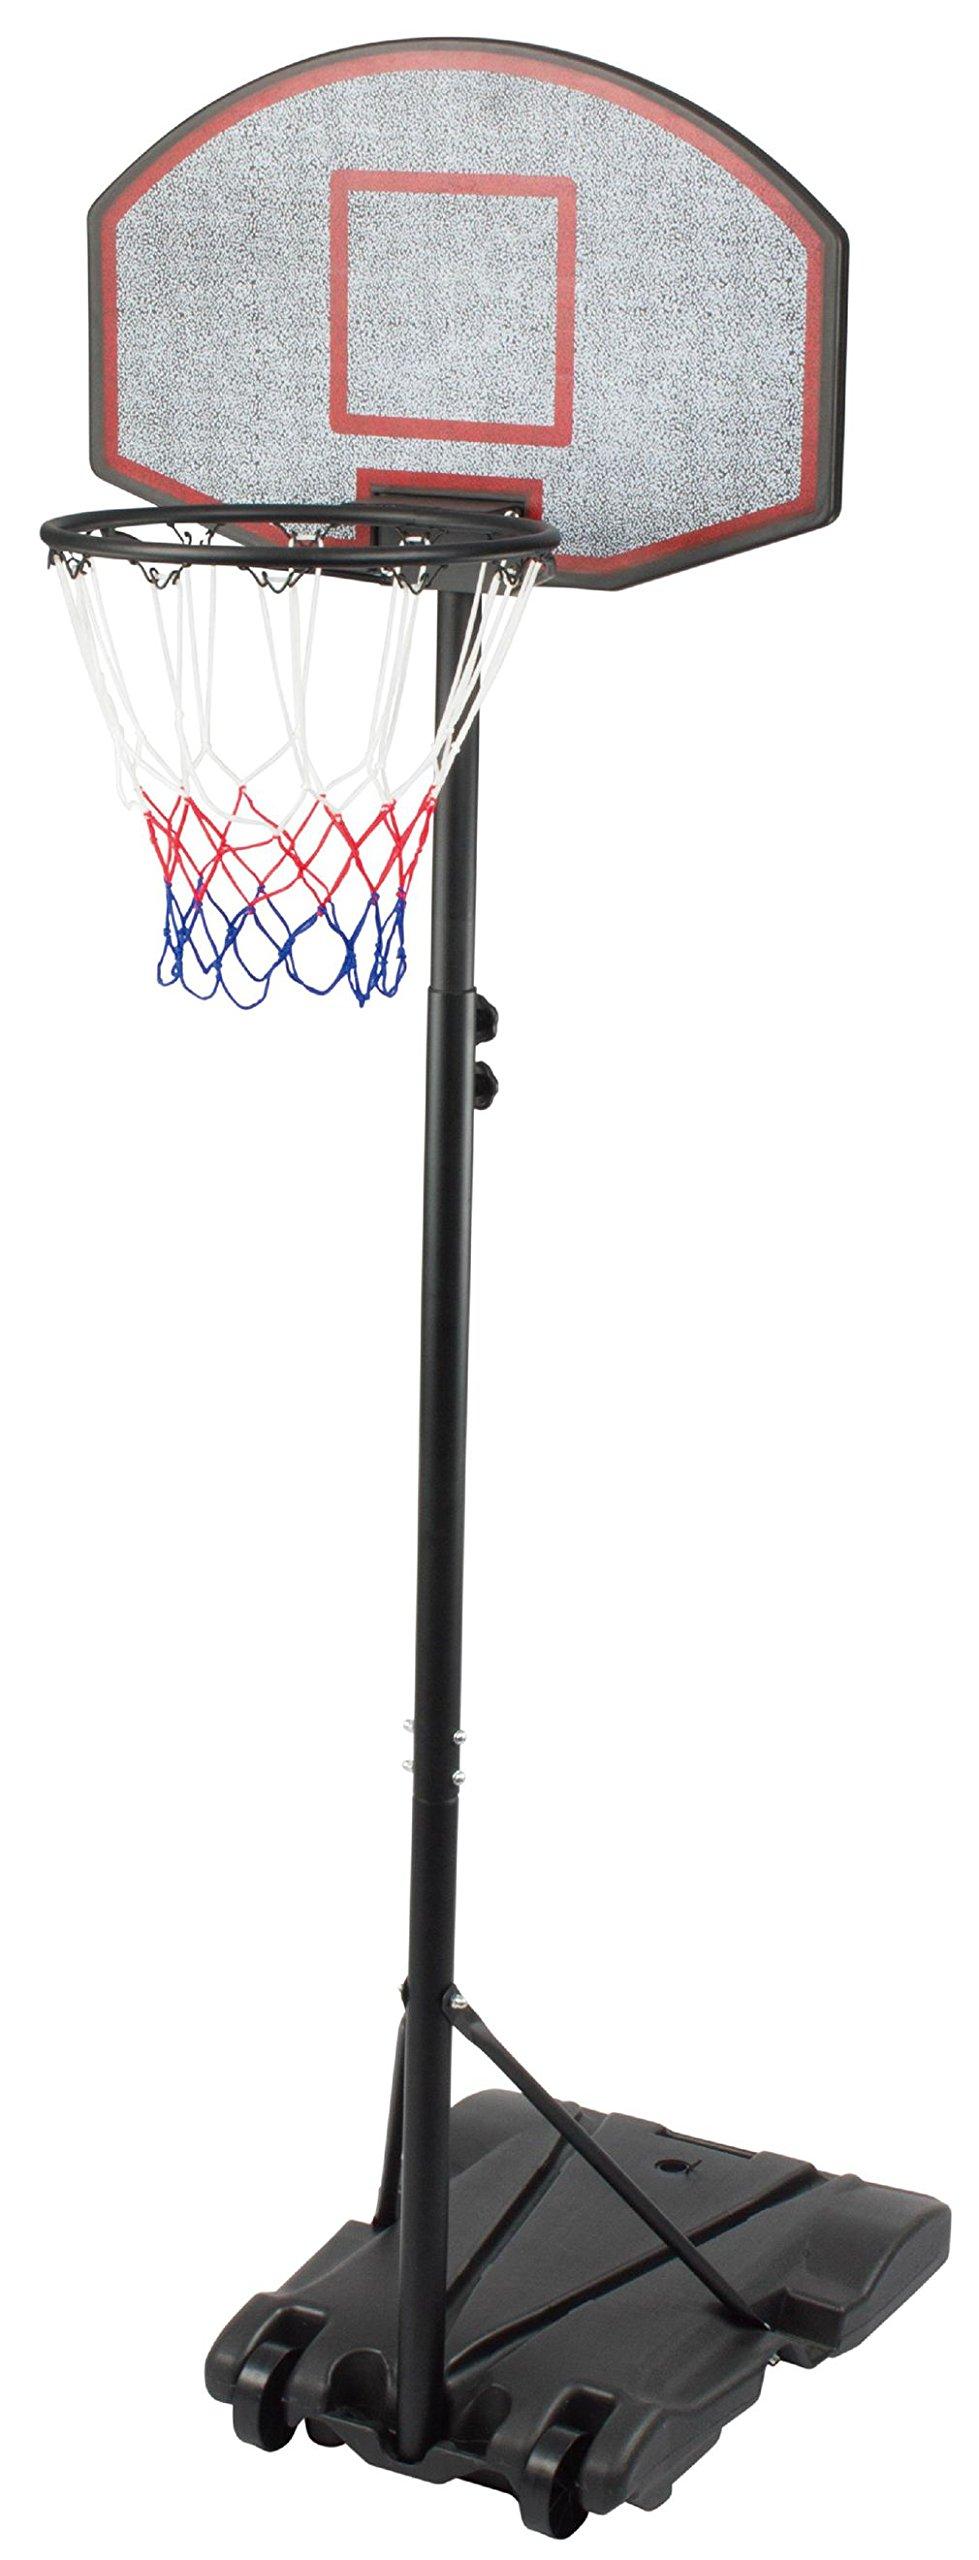 KLB Sport Adjustable Portable Youth Basketball Hoop (Black)